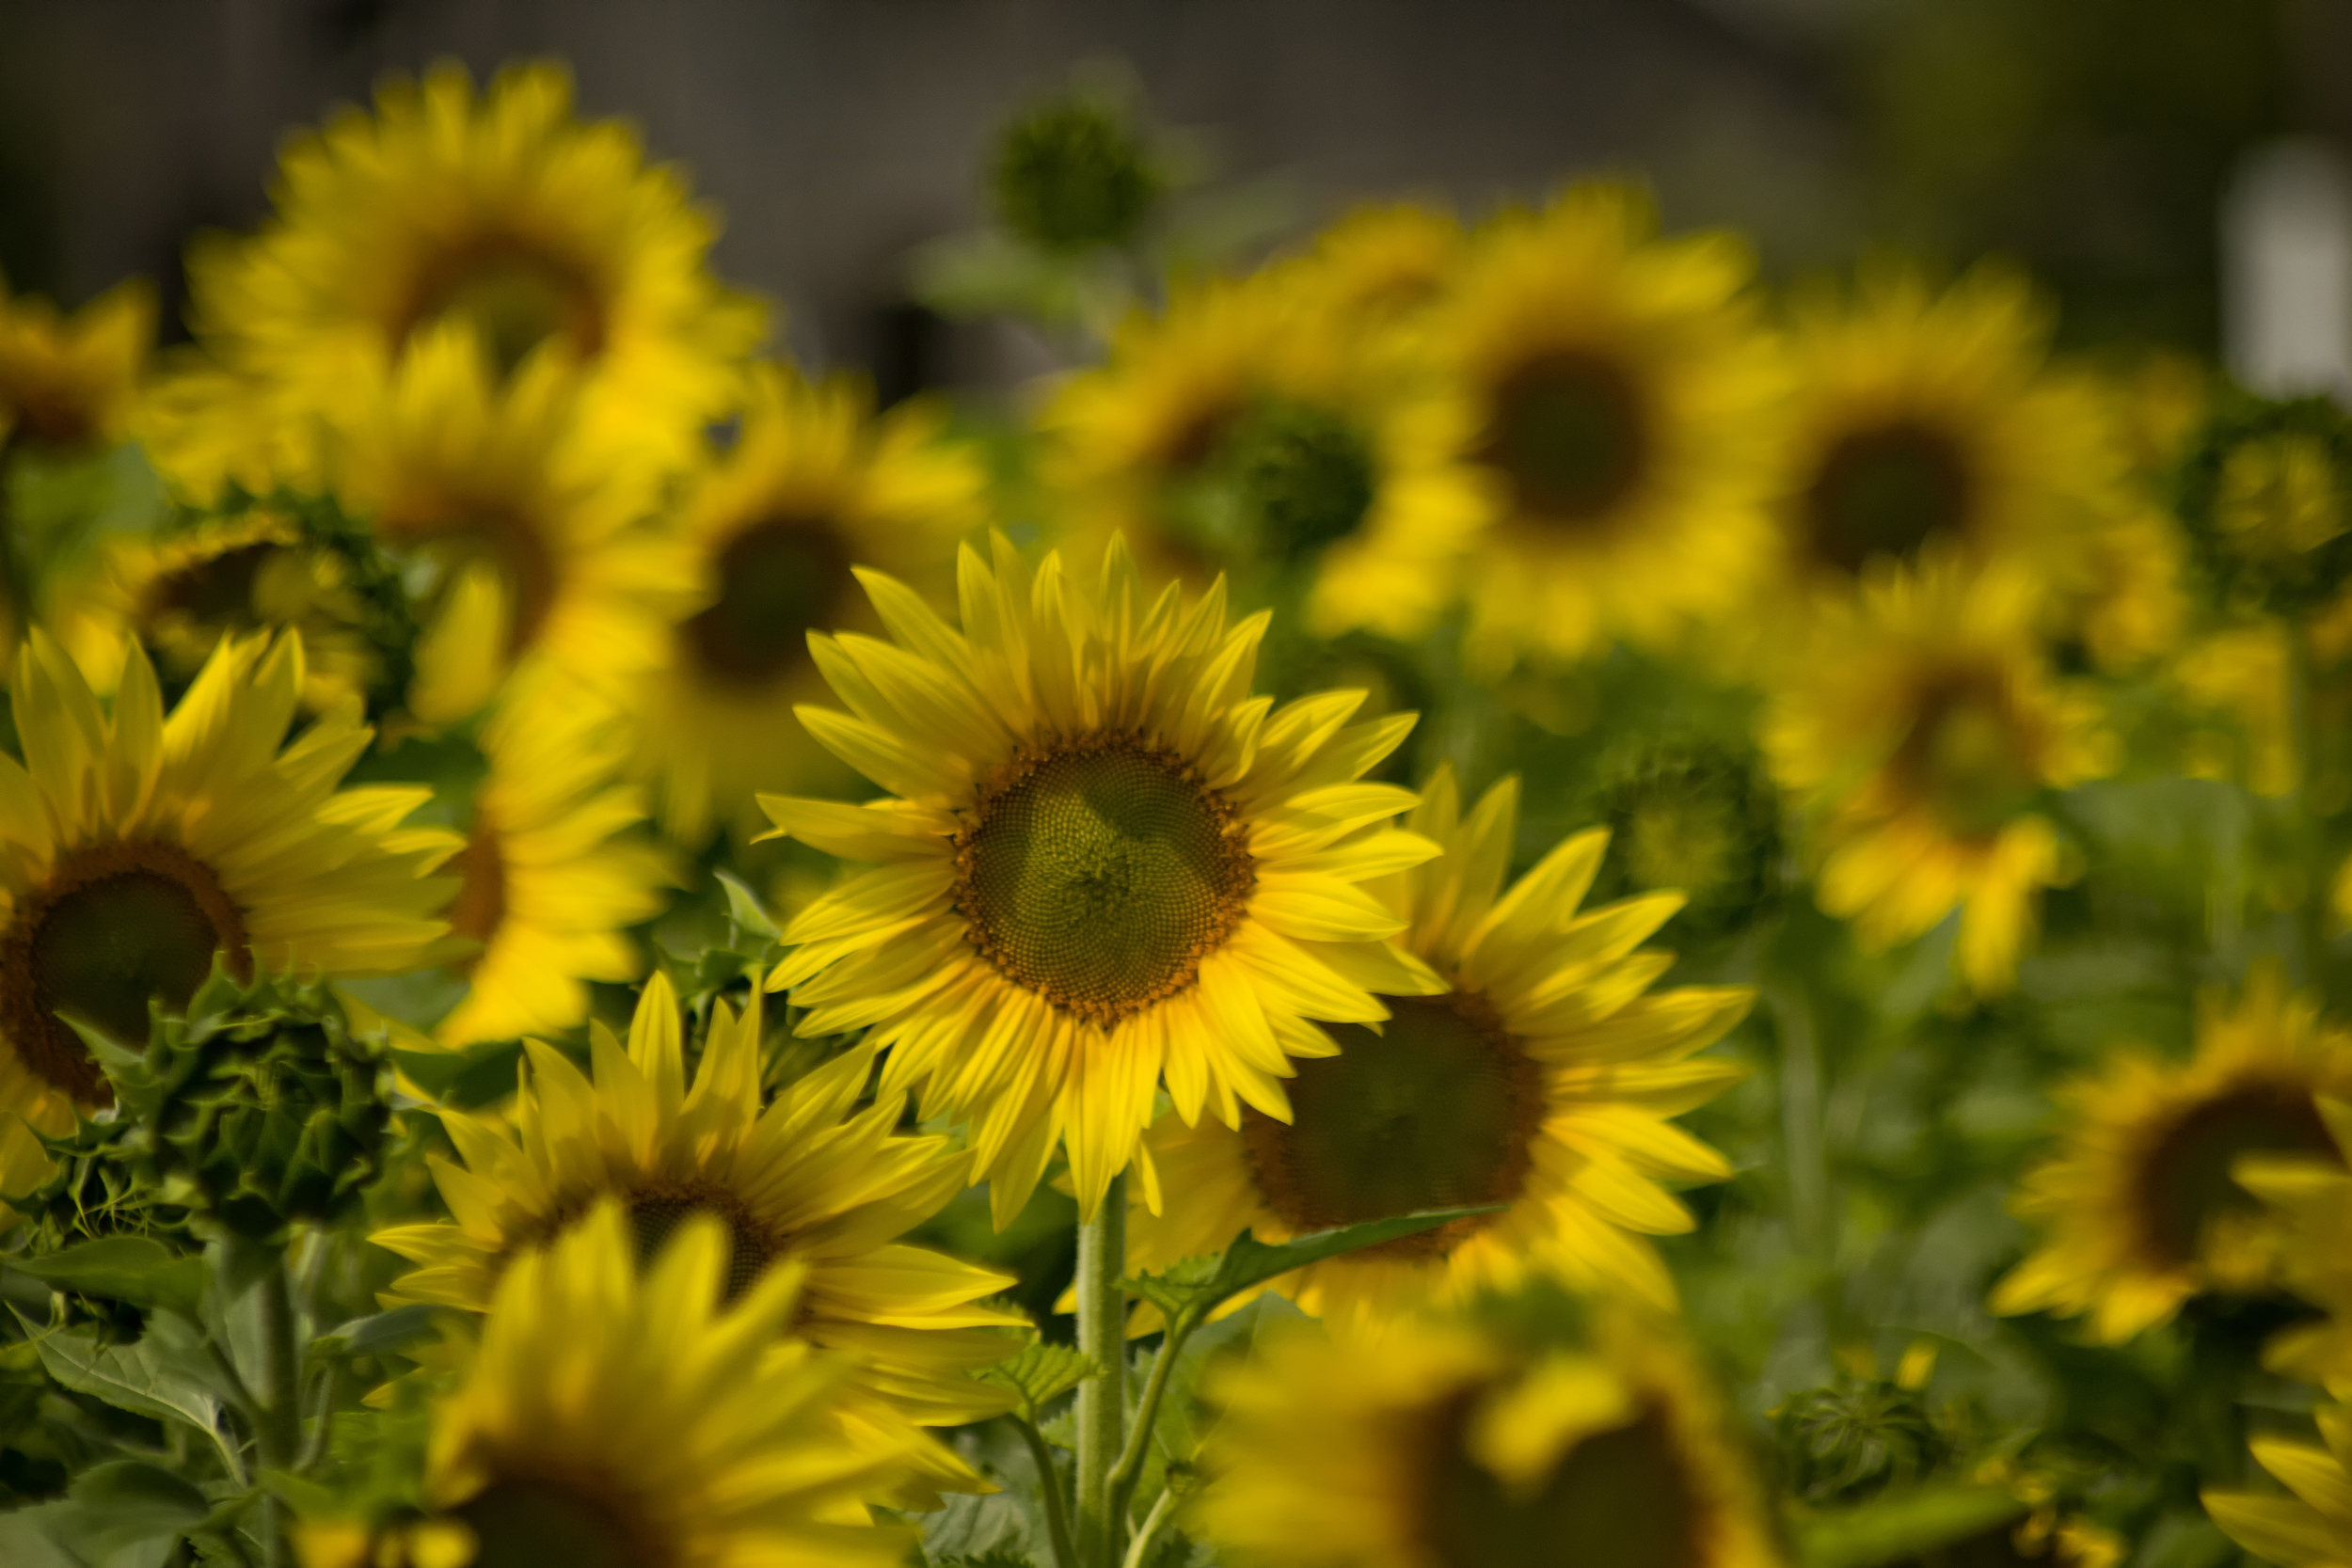 Linden Sunflowers